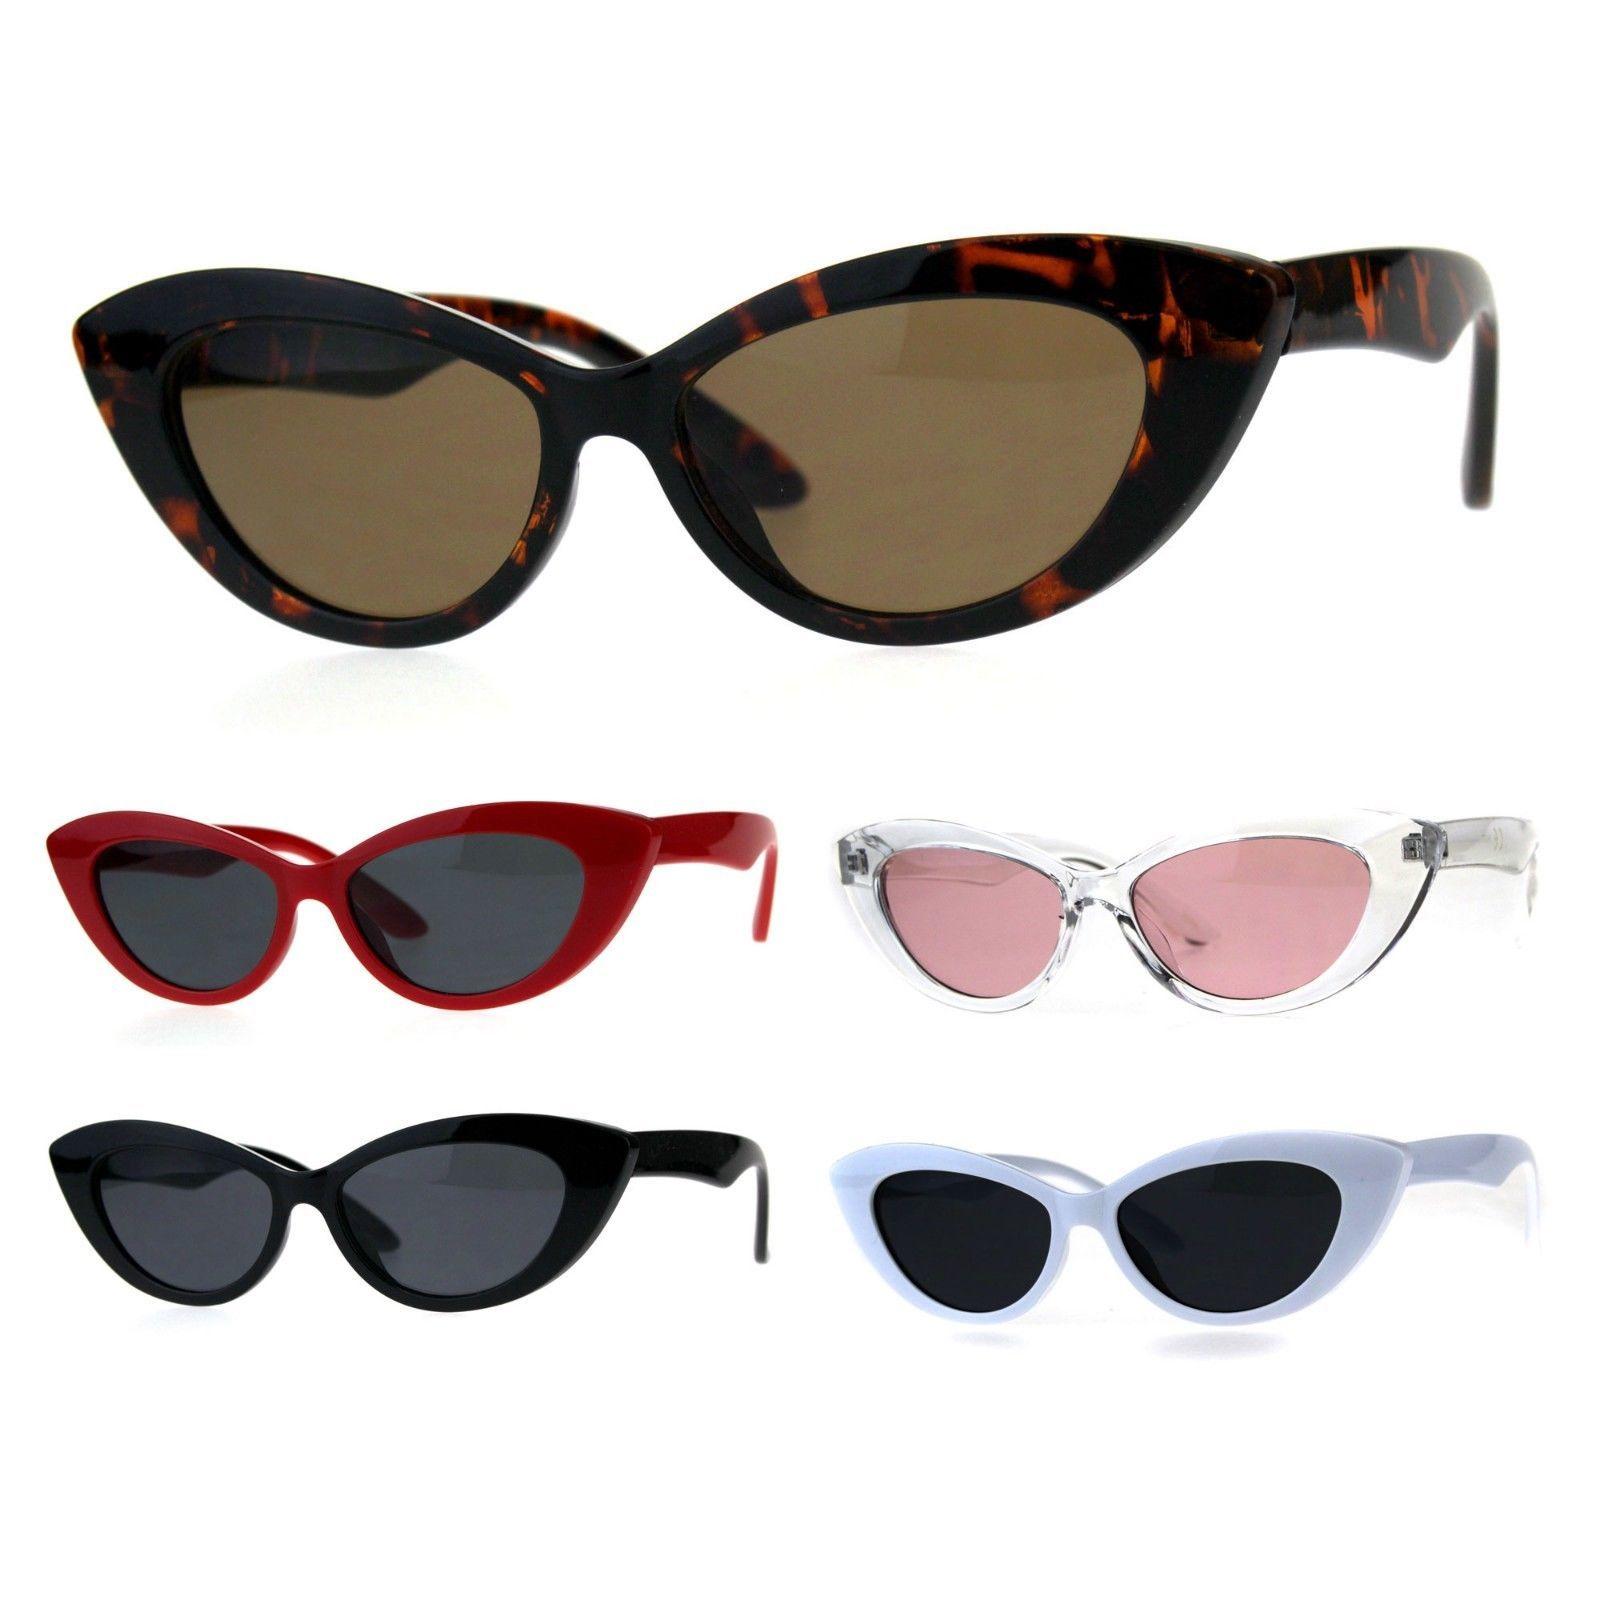 Womens Mod Minimal Plastic Cateye Goth Sunglasses